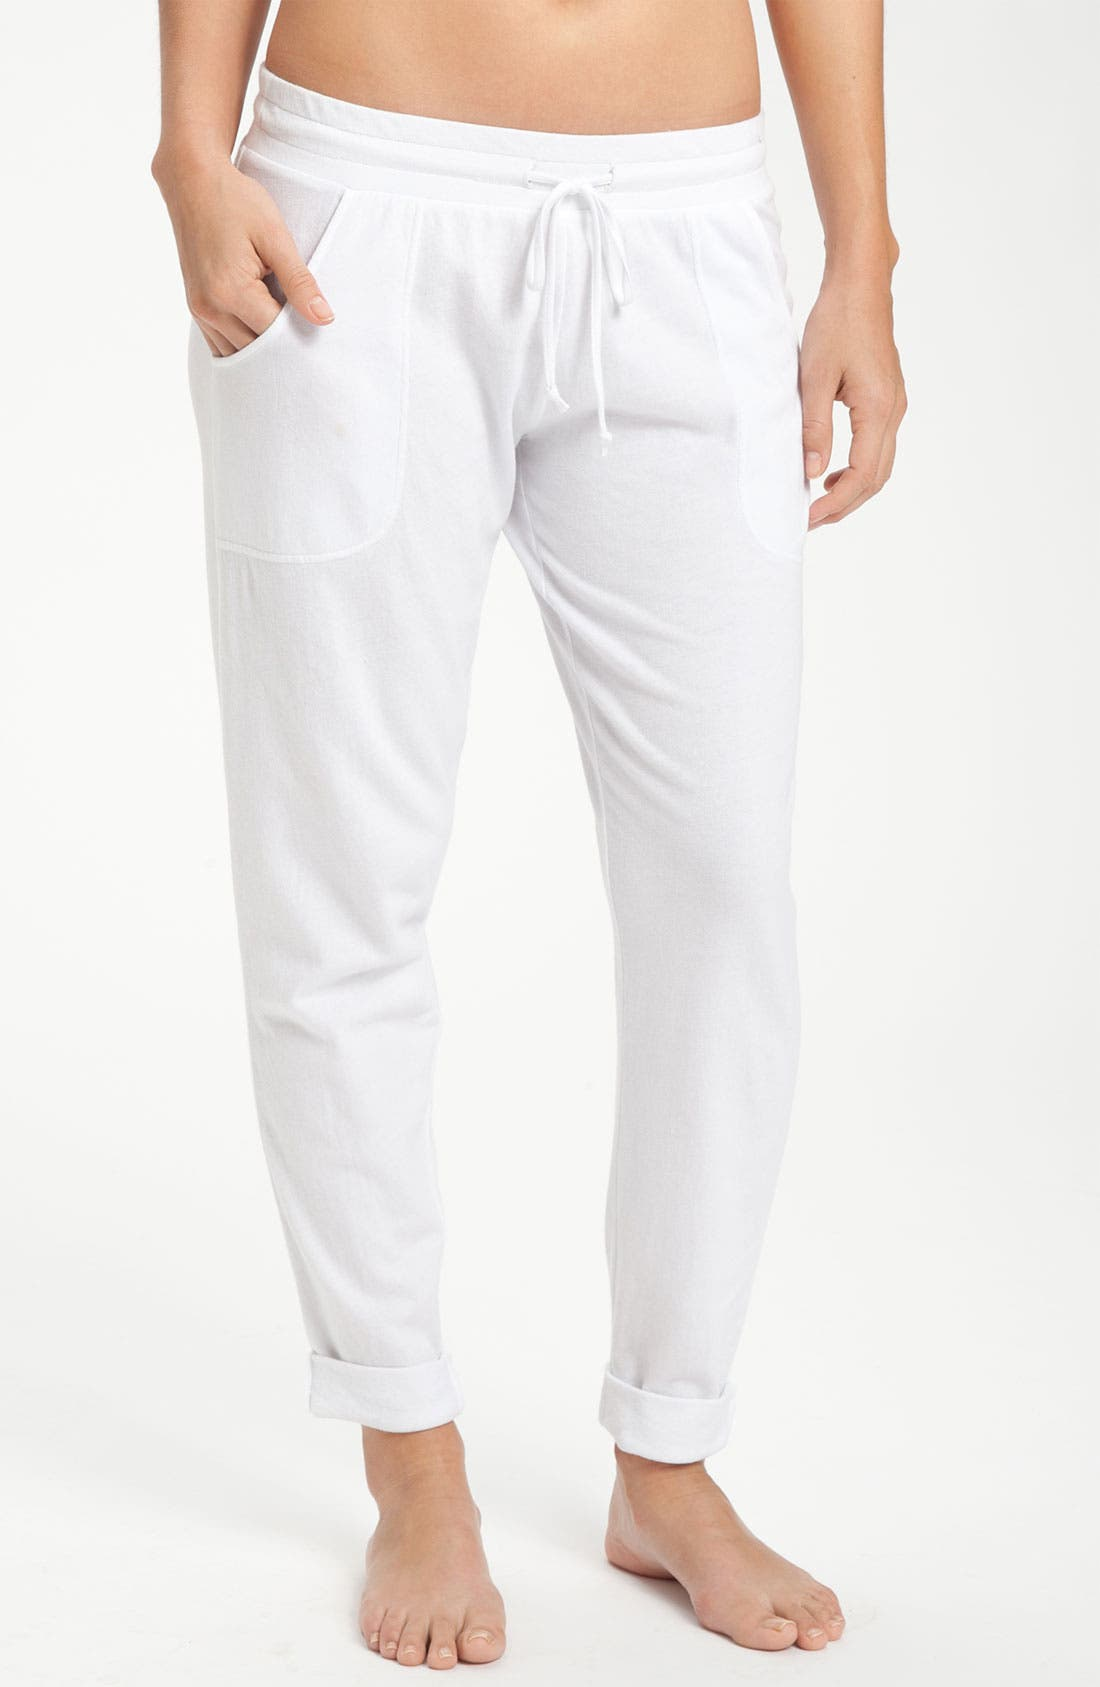 Alternate Image 1 Selected - Make + Model 'Close to You' Crop Pants